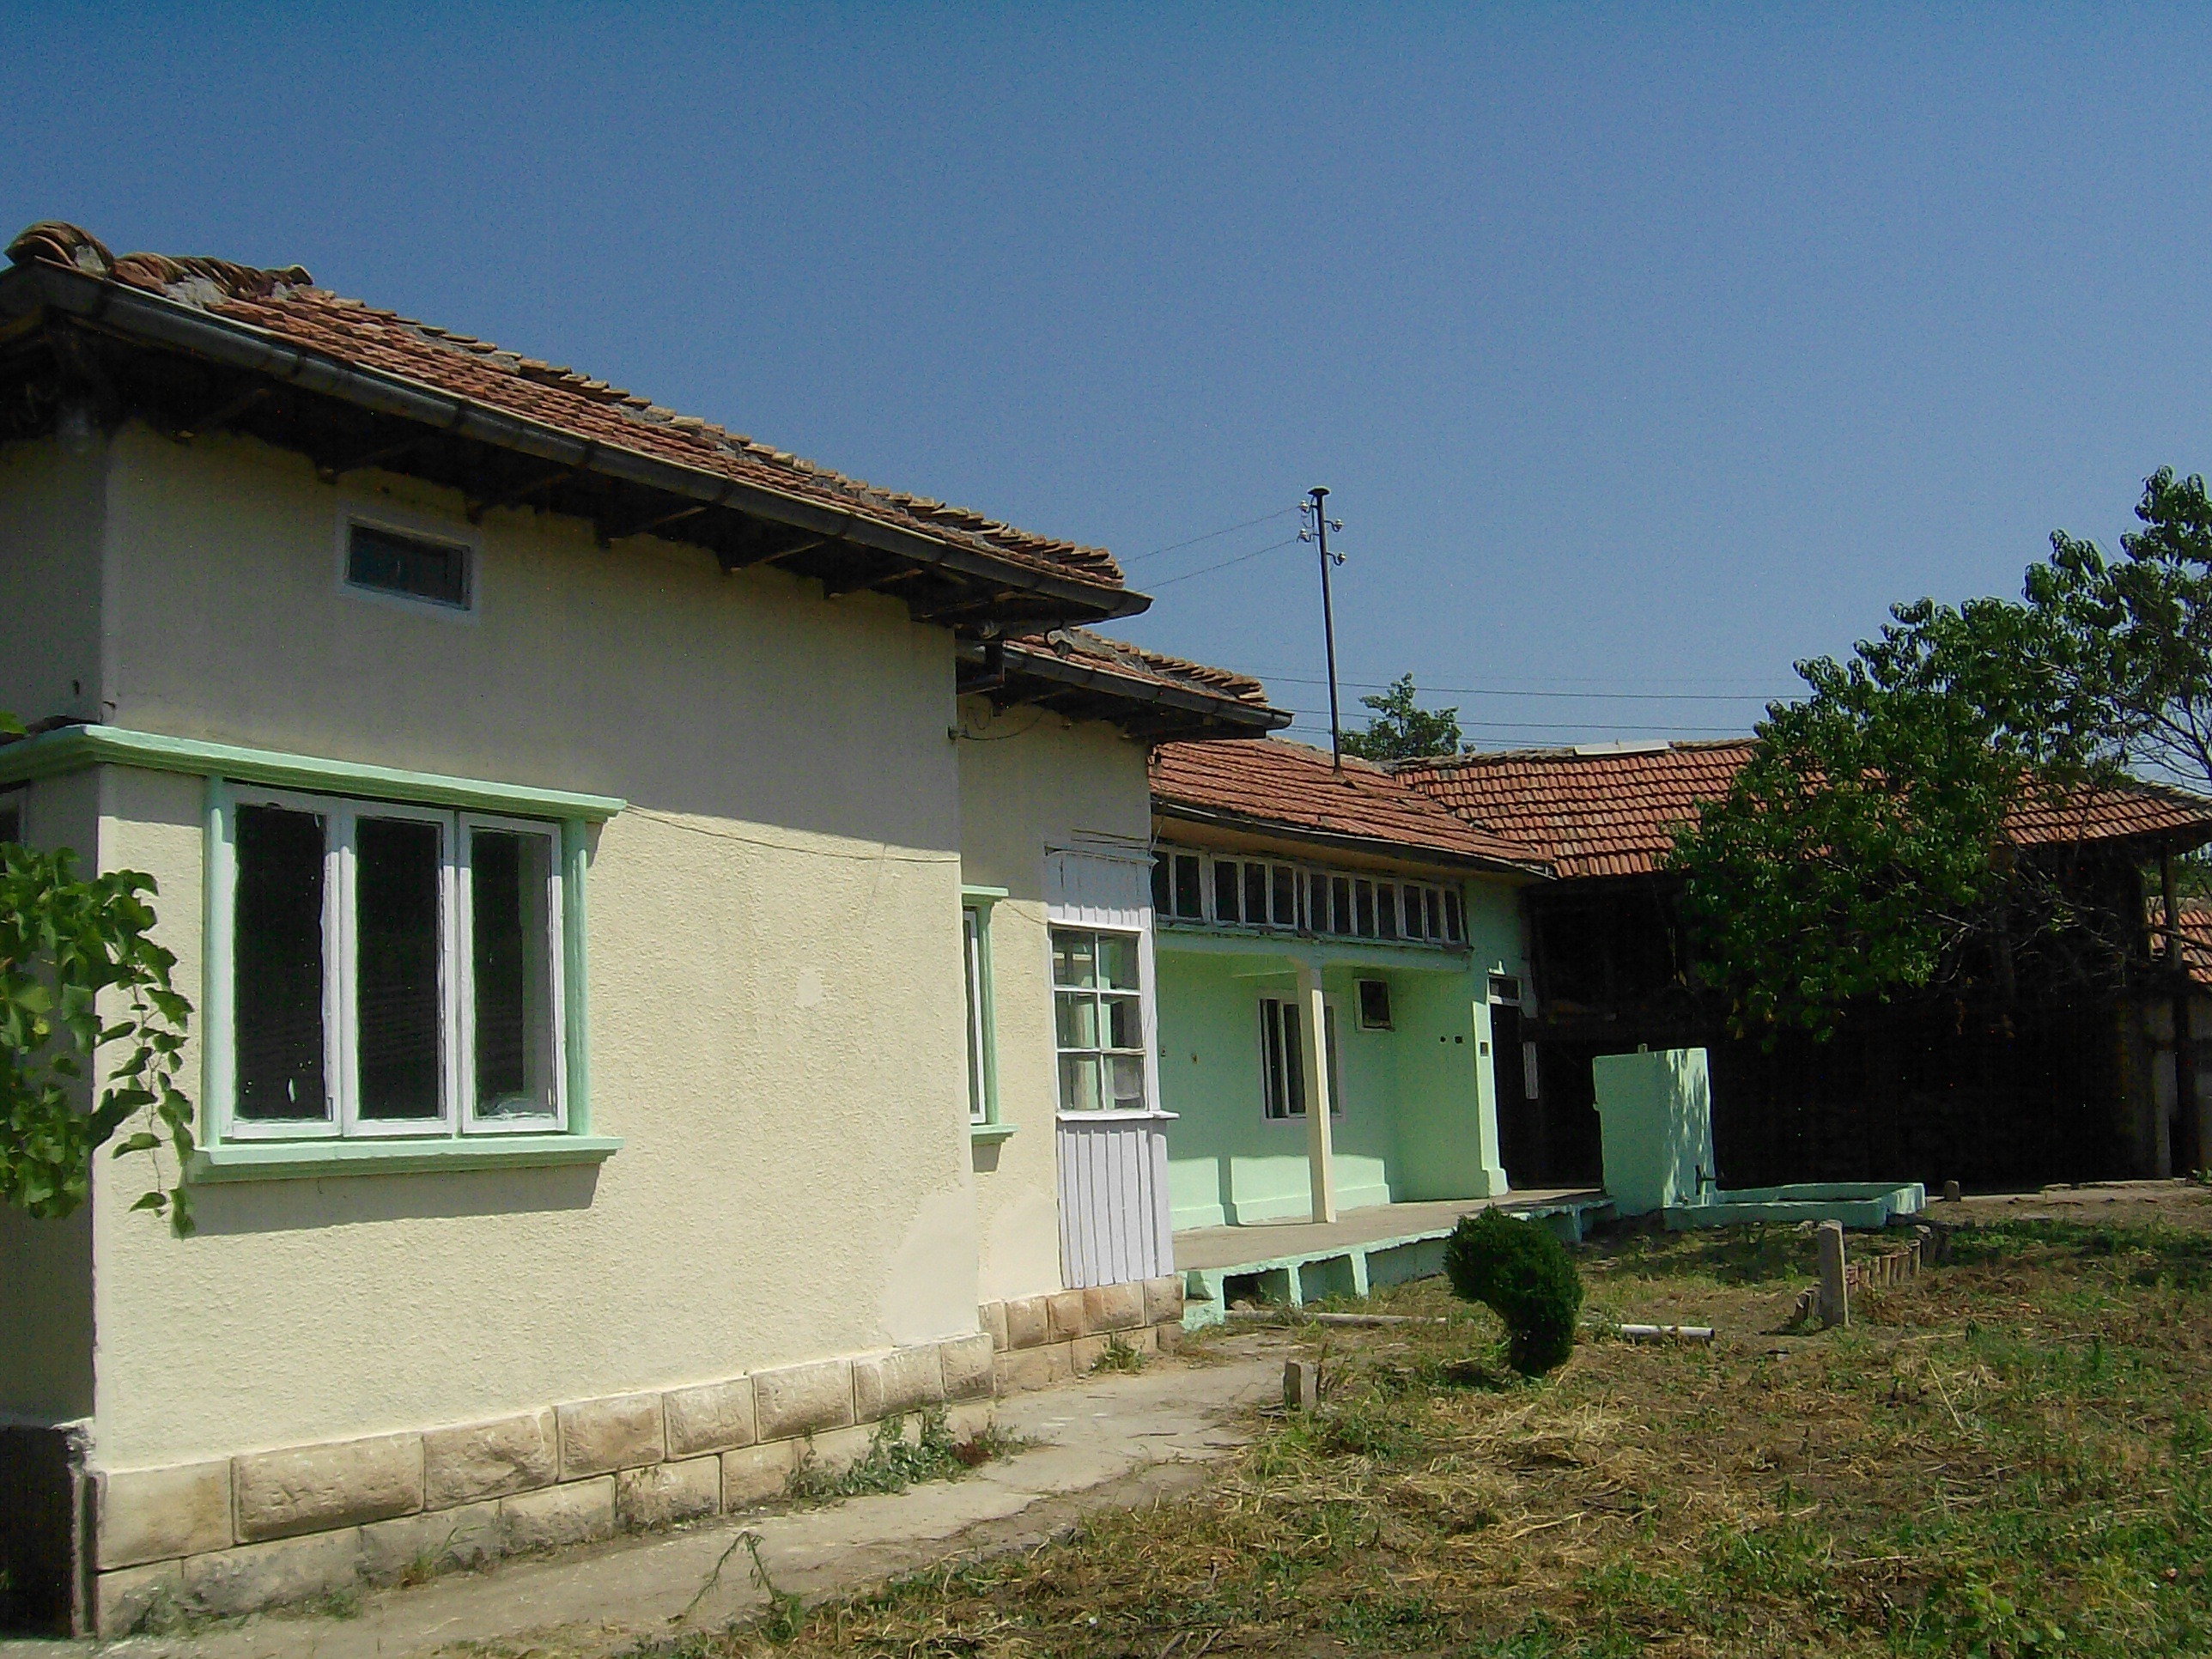 immobilien haus in karamanovo ruse bulgarien 70 qm haus land qm garage 25 qm. Black Bedroom Furniture Sets. Home Design Ideas